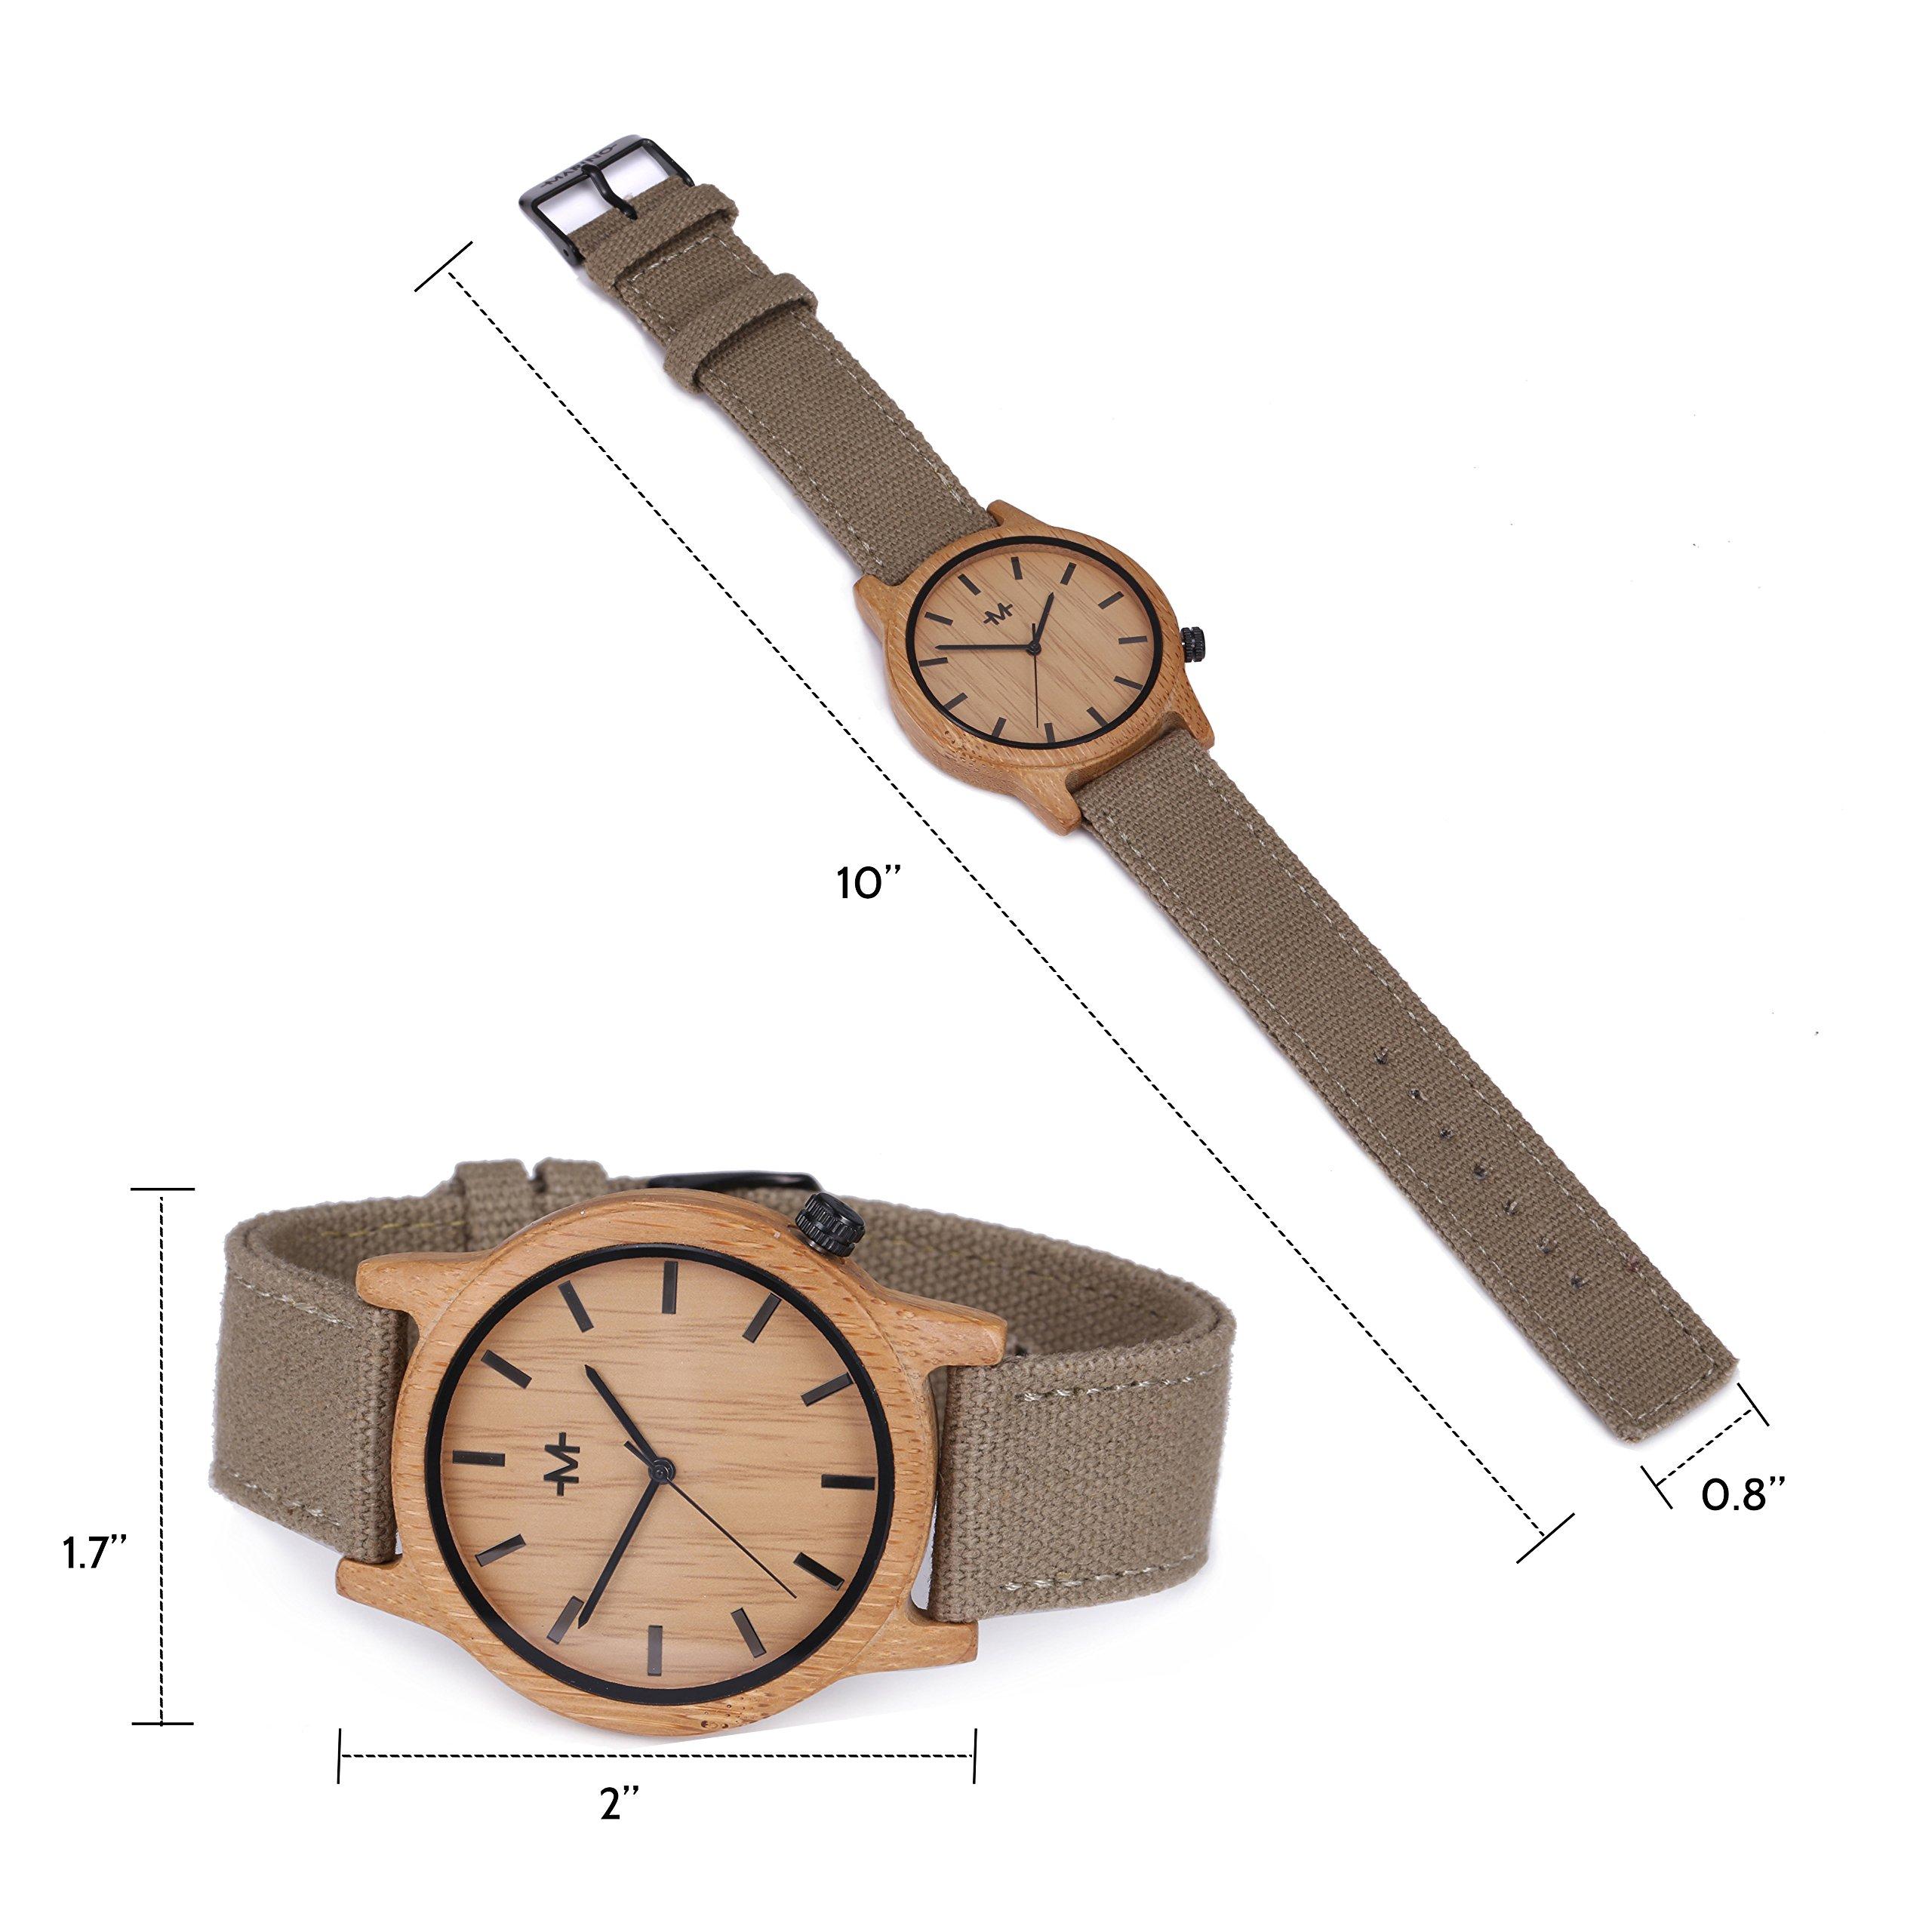 Marino Mens Wooden Watch - Wrist watches for Men - Dress Wood Watch (One Size, Khaki - Canvas Band) by Marino Avenue (Image #5)